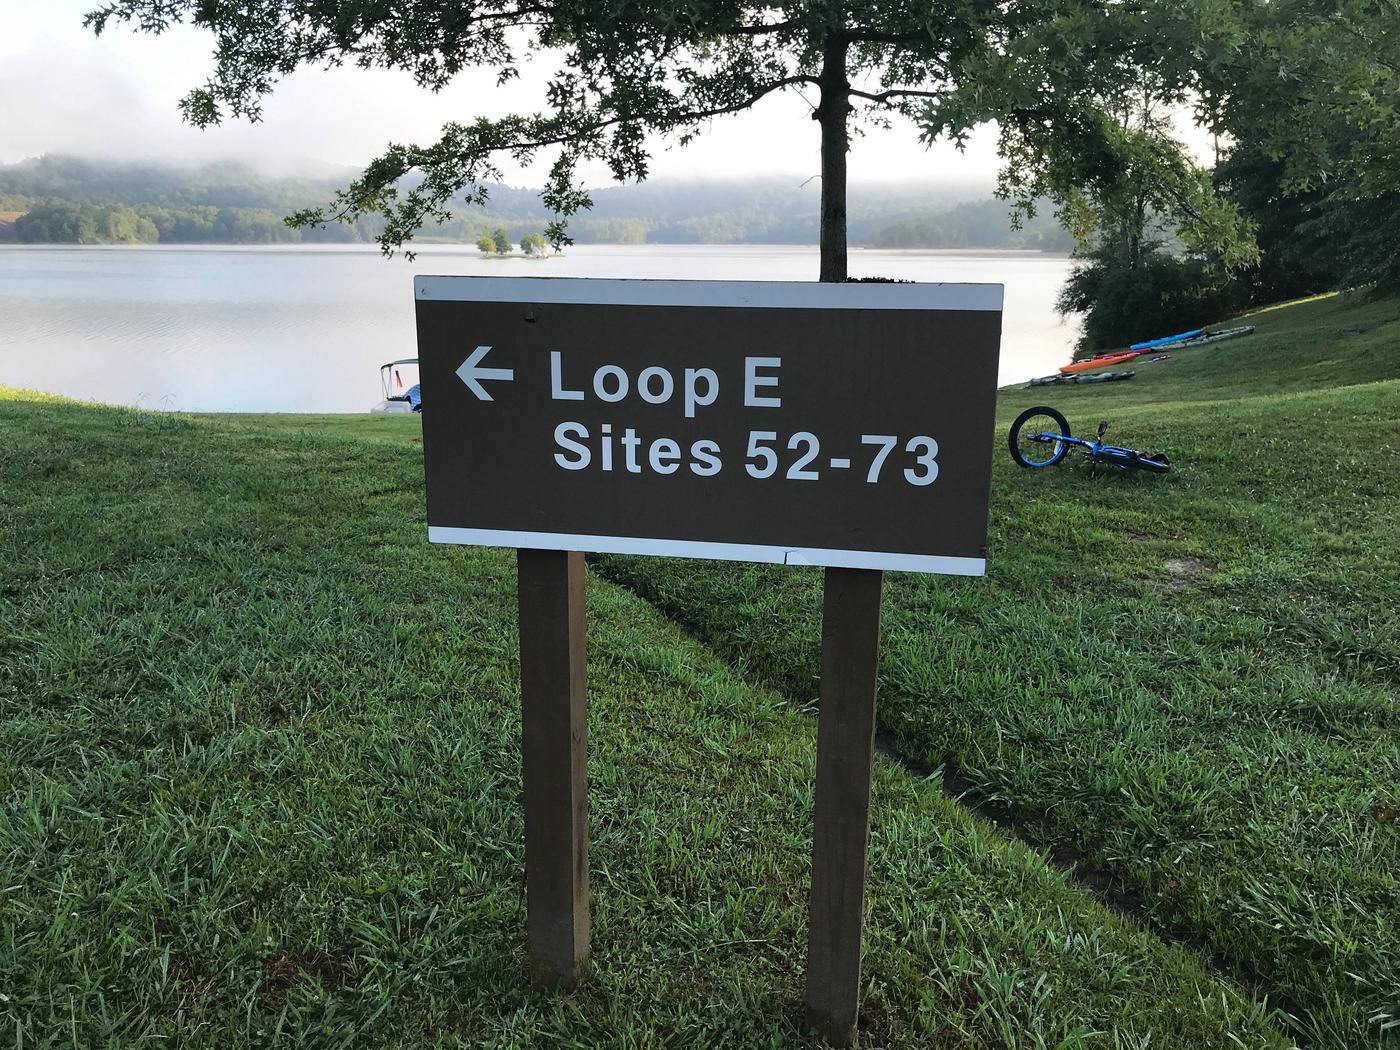 Loop E